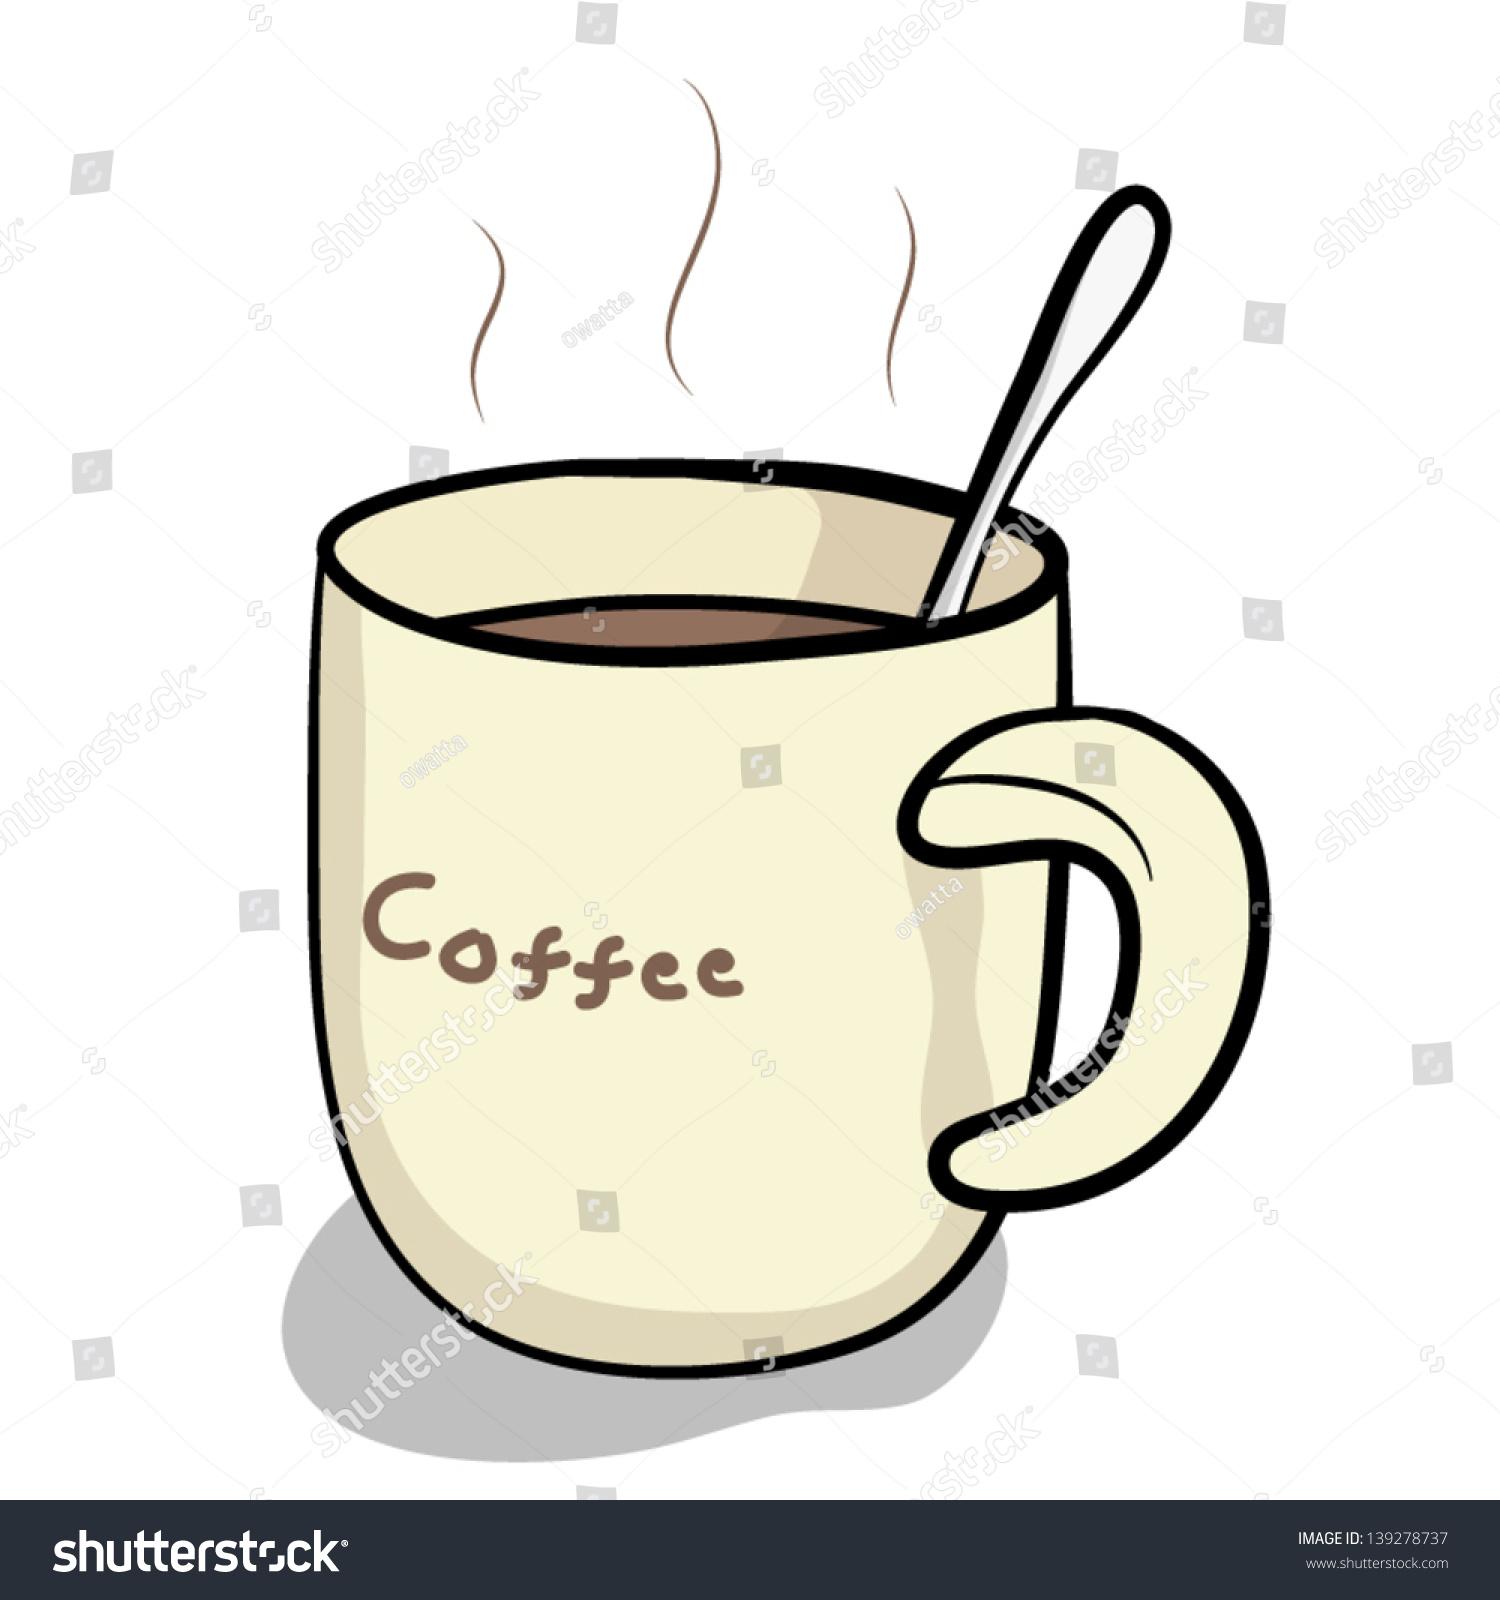 hot coffee white background - photo #33